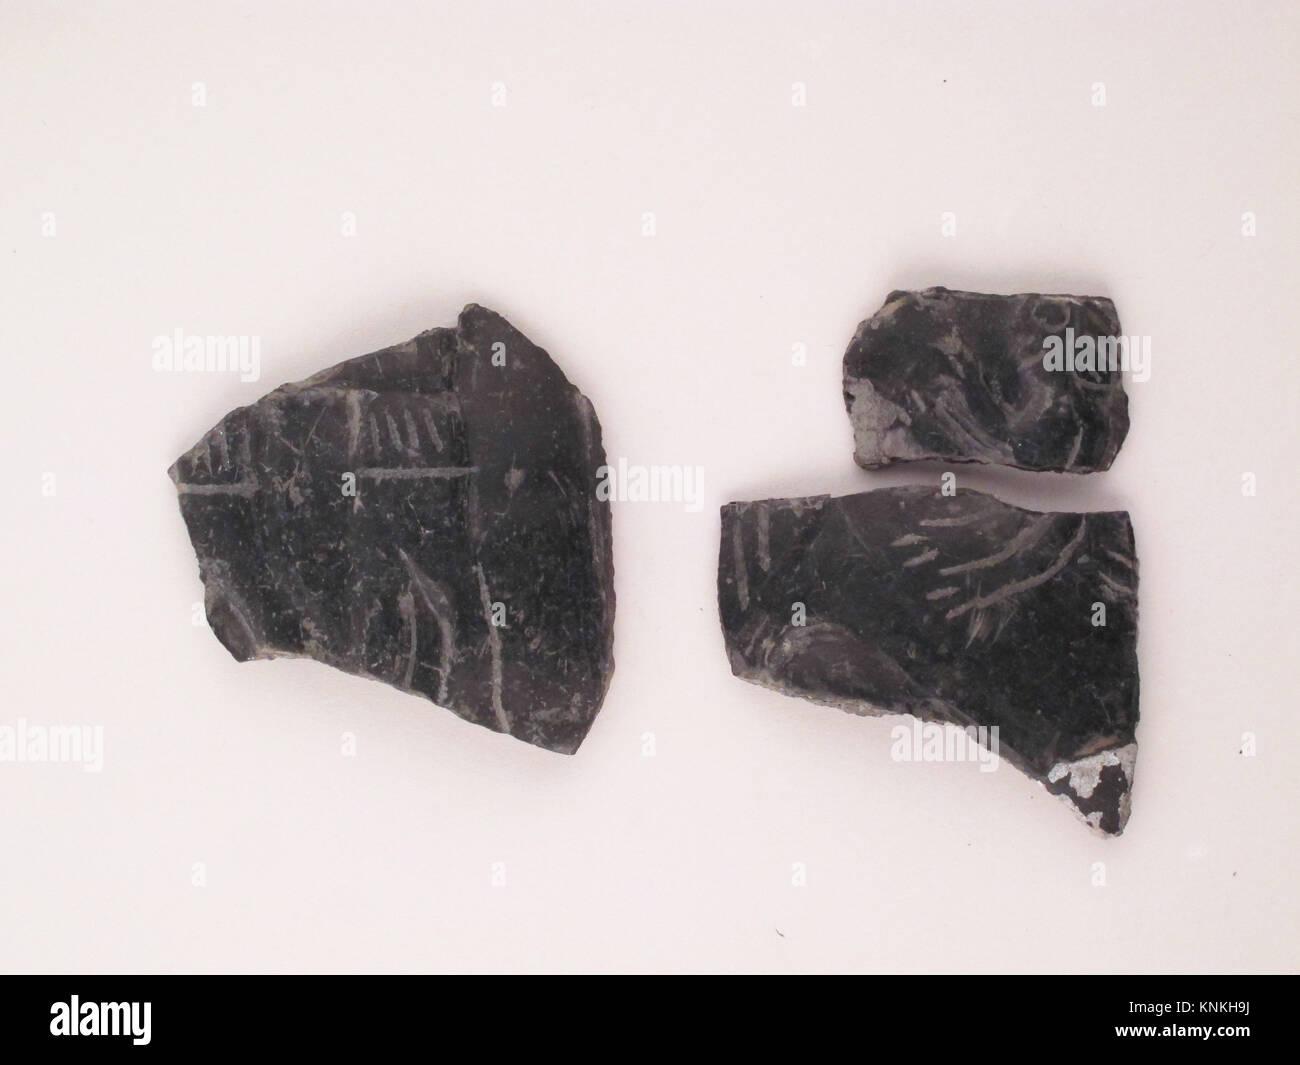 Vase fragment. Period: Archaic; Date: 570-550 B.C; Culture: Etruscan; Medium: Terracotta; bucchero pesante; Dimensions: Stock Photo